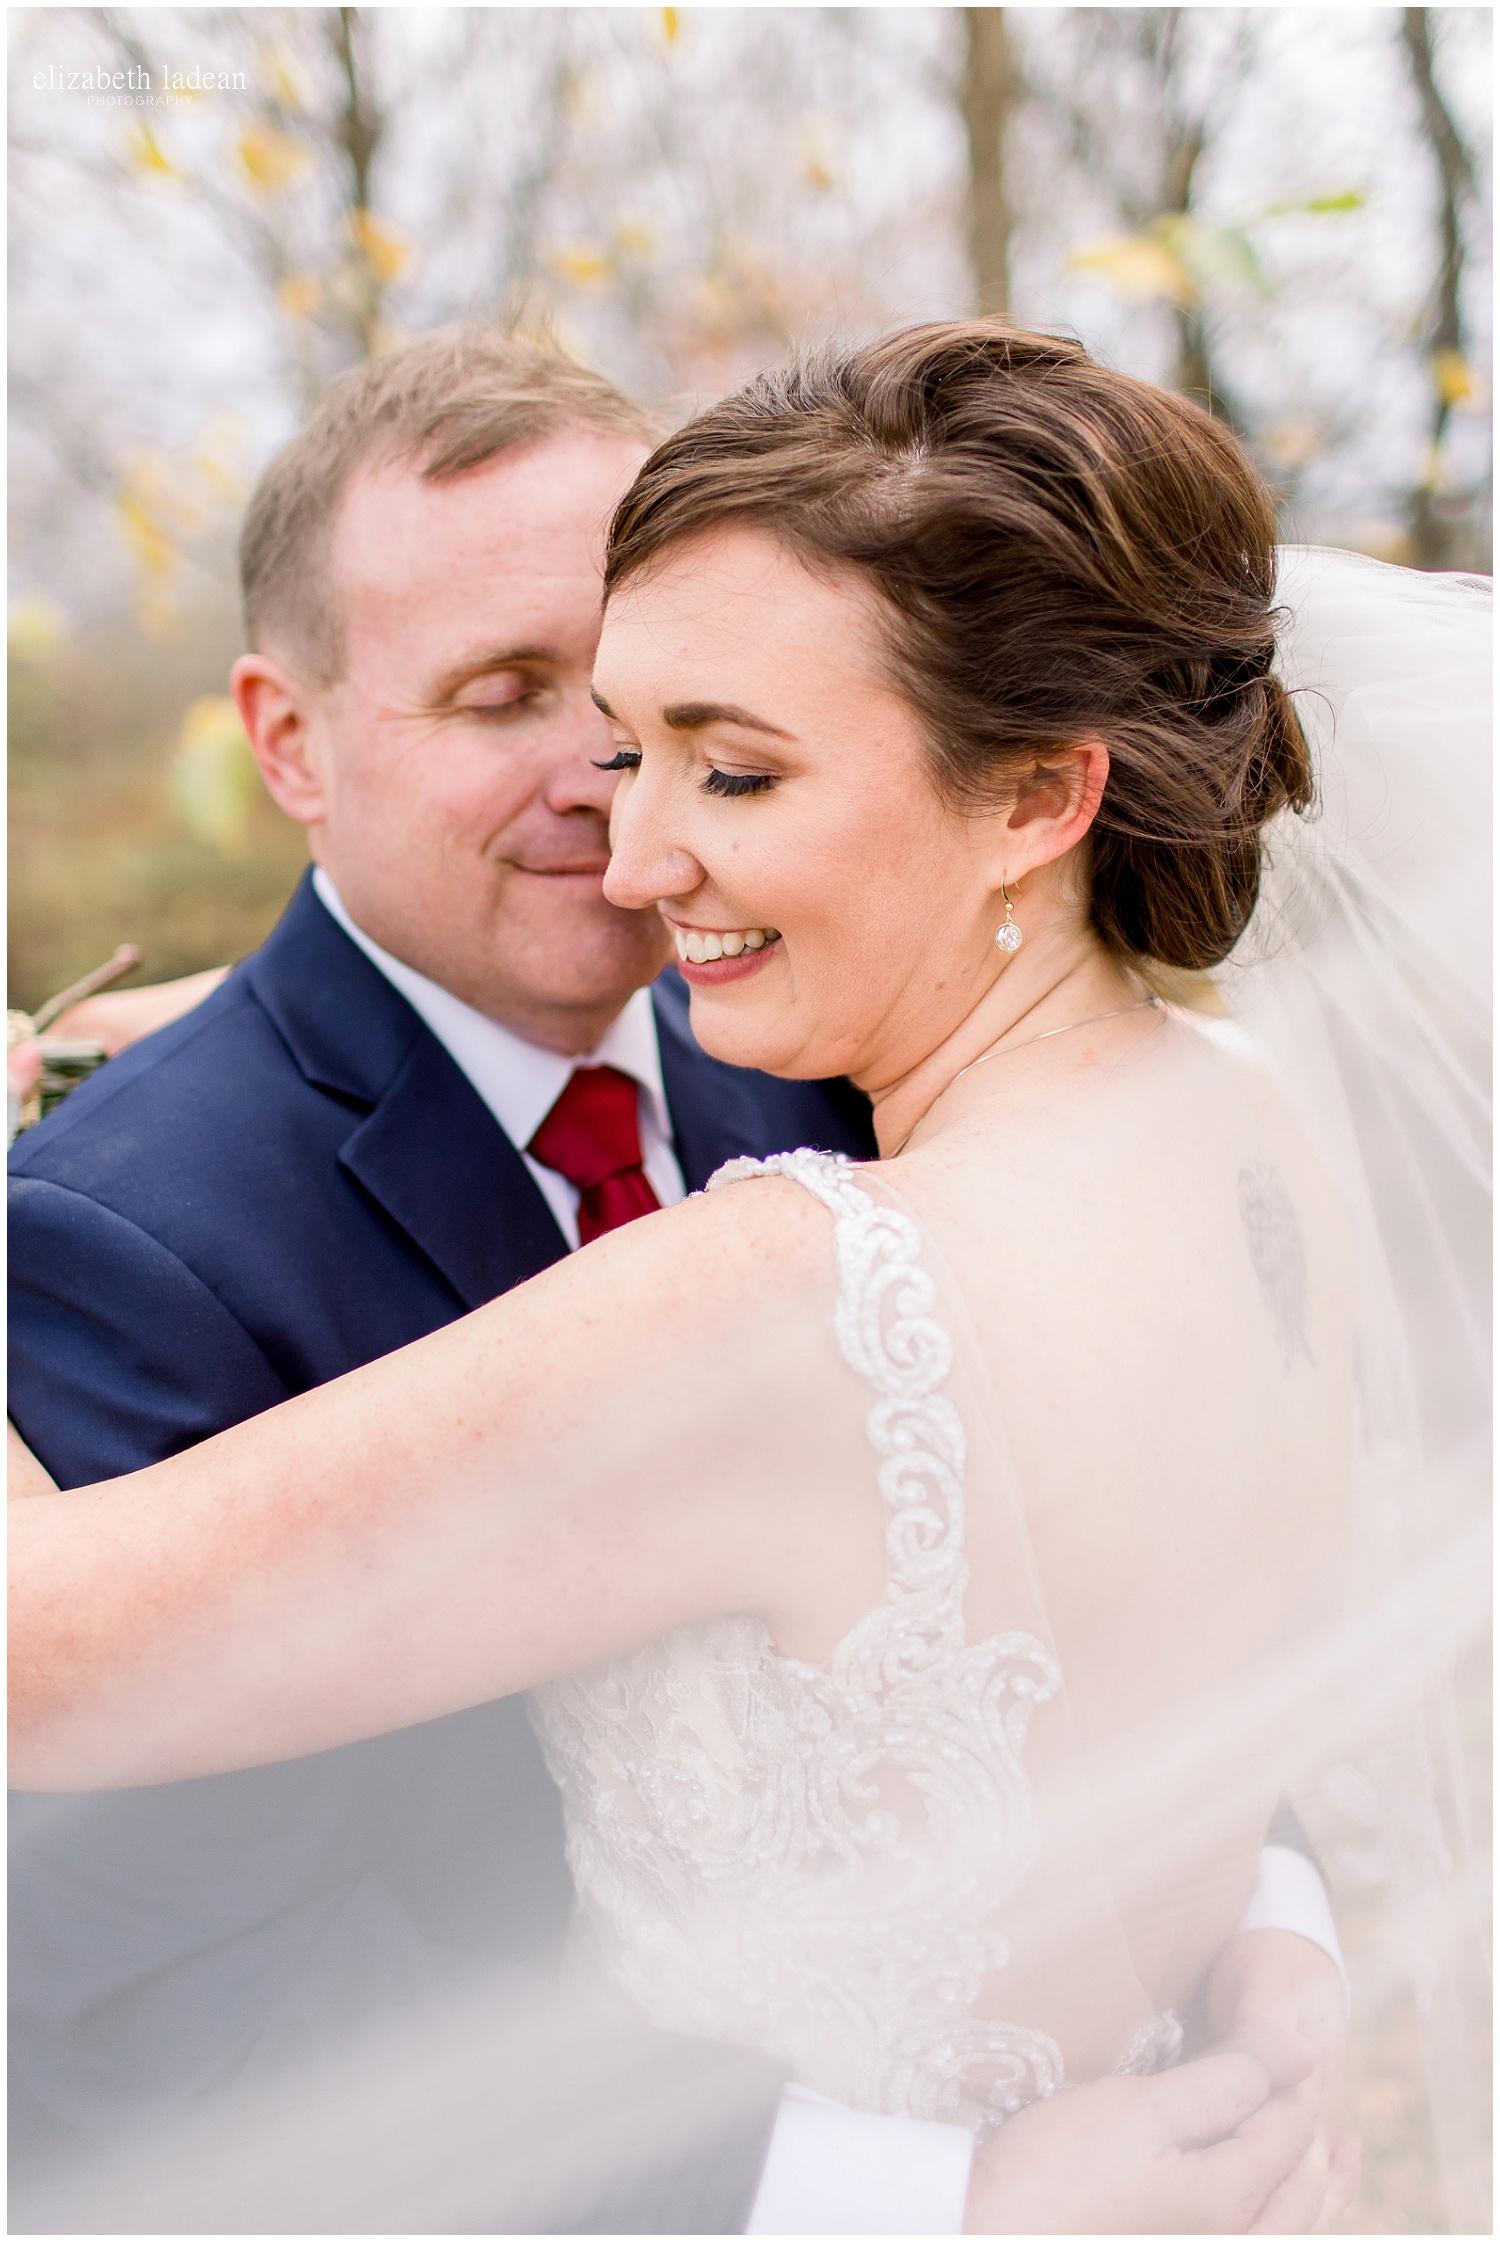 -Adventurous-Kansas-City-Worldwide-Wedding-Photographer-2018-elizabeth-ladean-photography-photo_3404.jpg